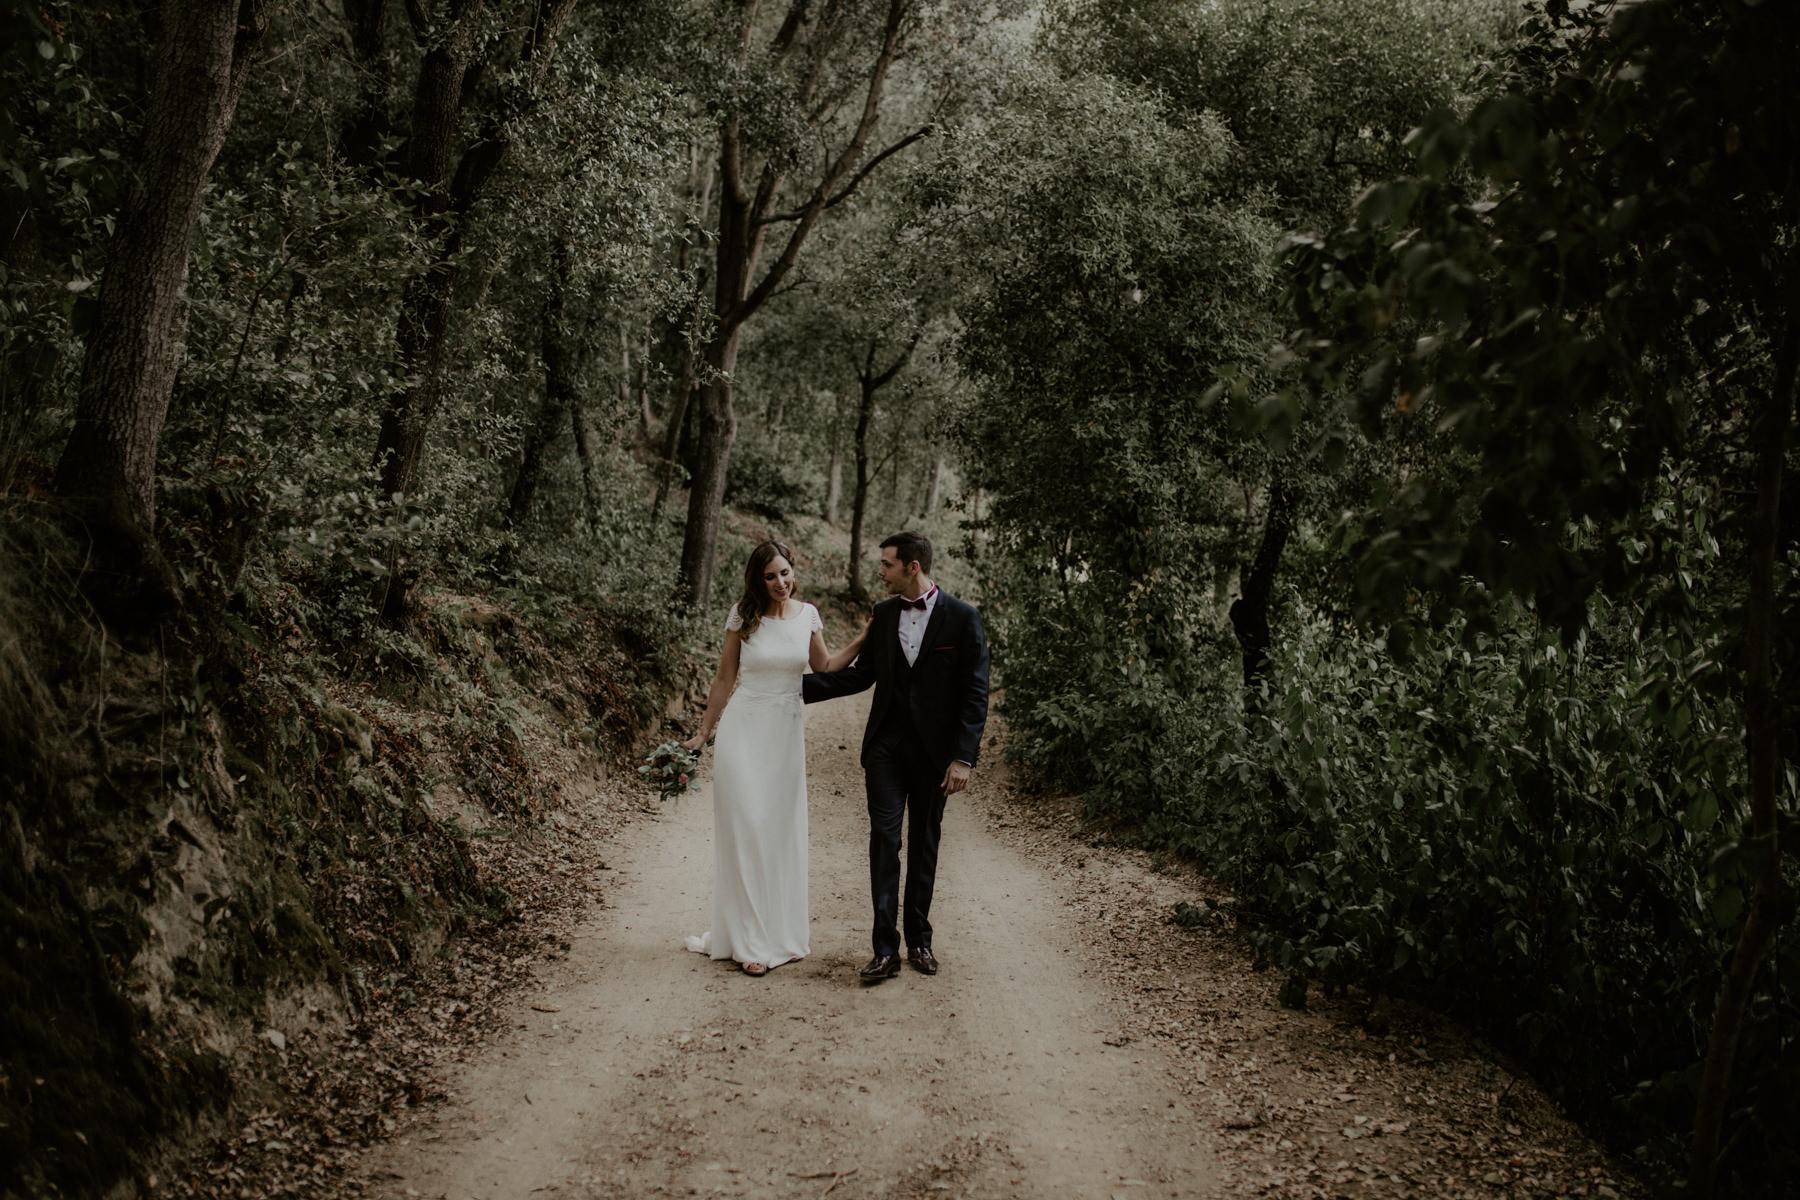 alt_thenortherngirlphotography_couples_weddingphotographer_photographer_wedding_boda_fotografodebodas_fotografobodasbarcelona_bodaindie_bodasconestilo_bodaensantperedeclara_jennifermiguel-528.jpg